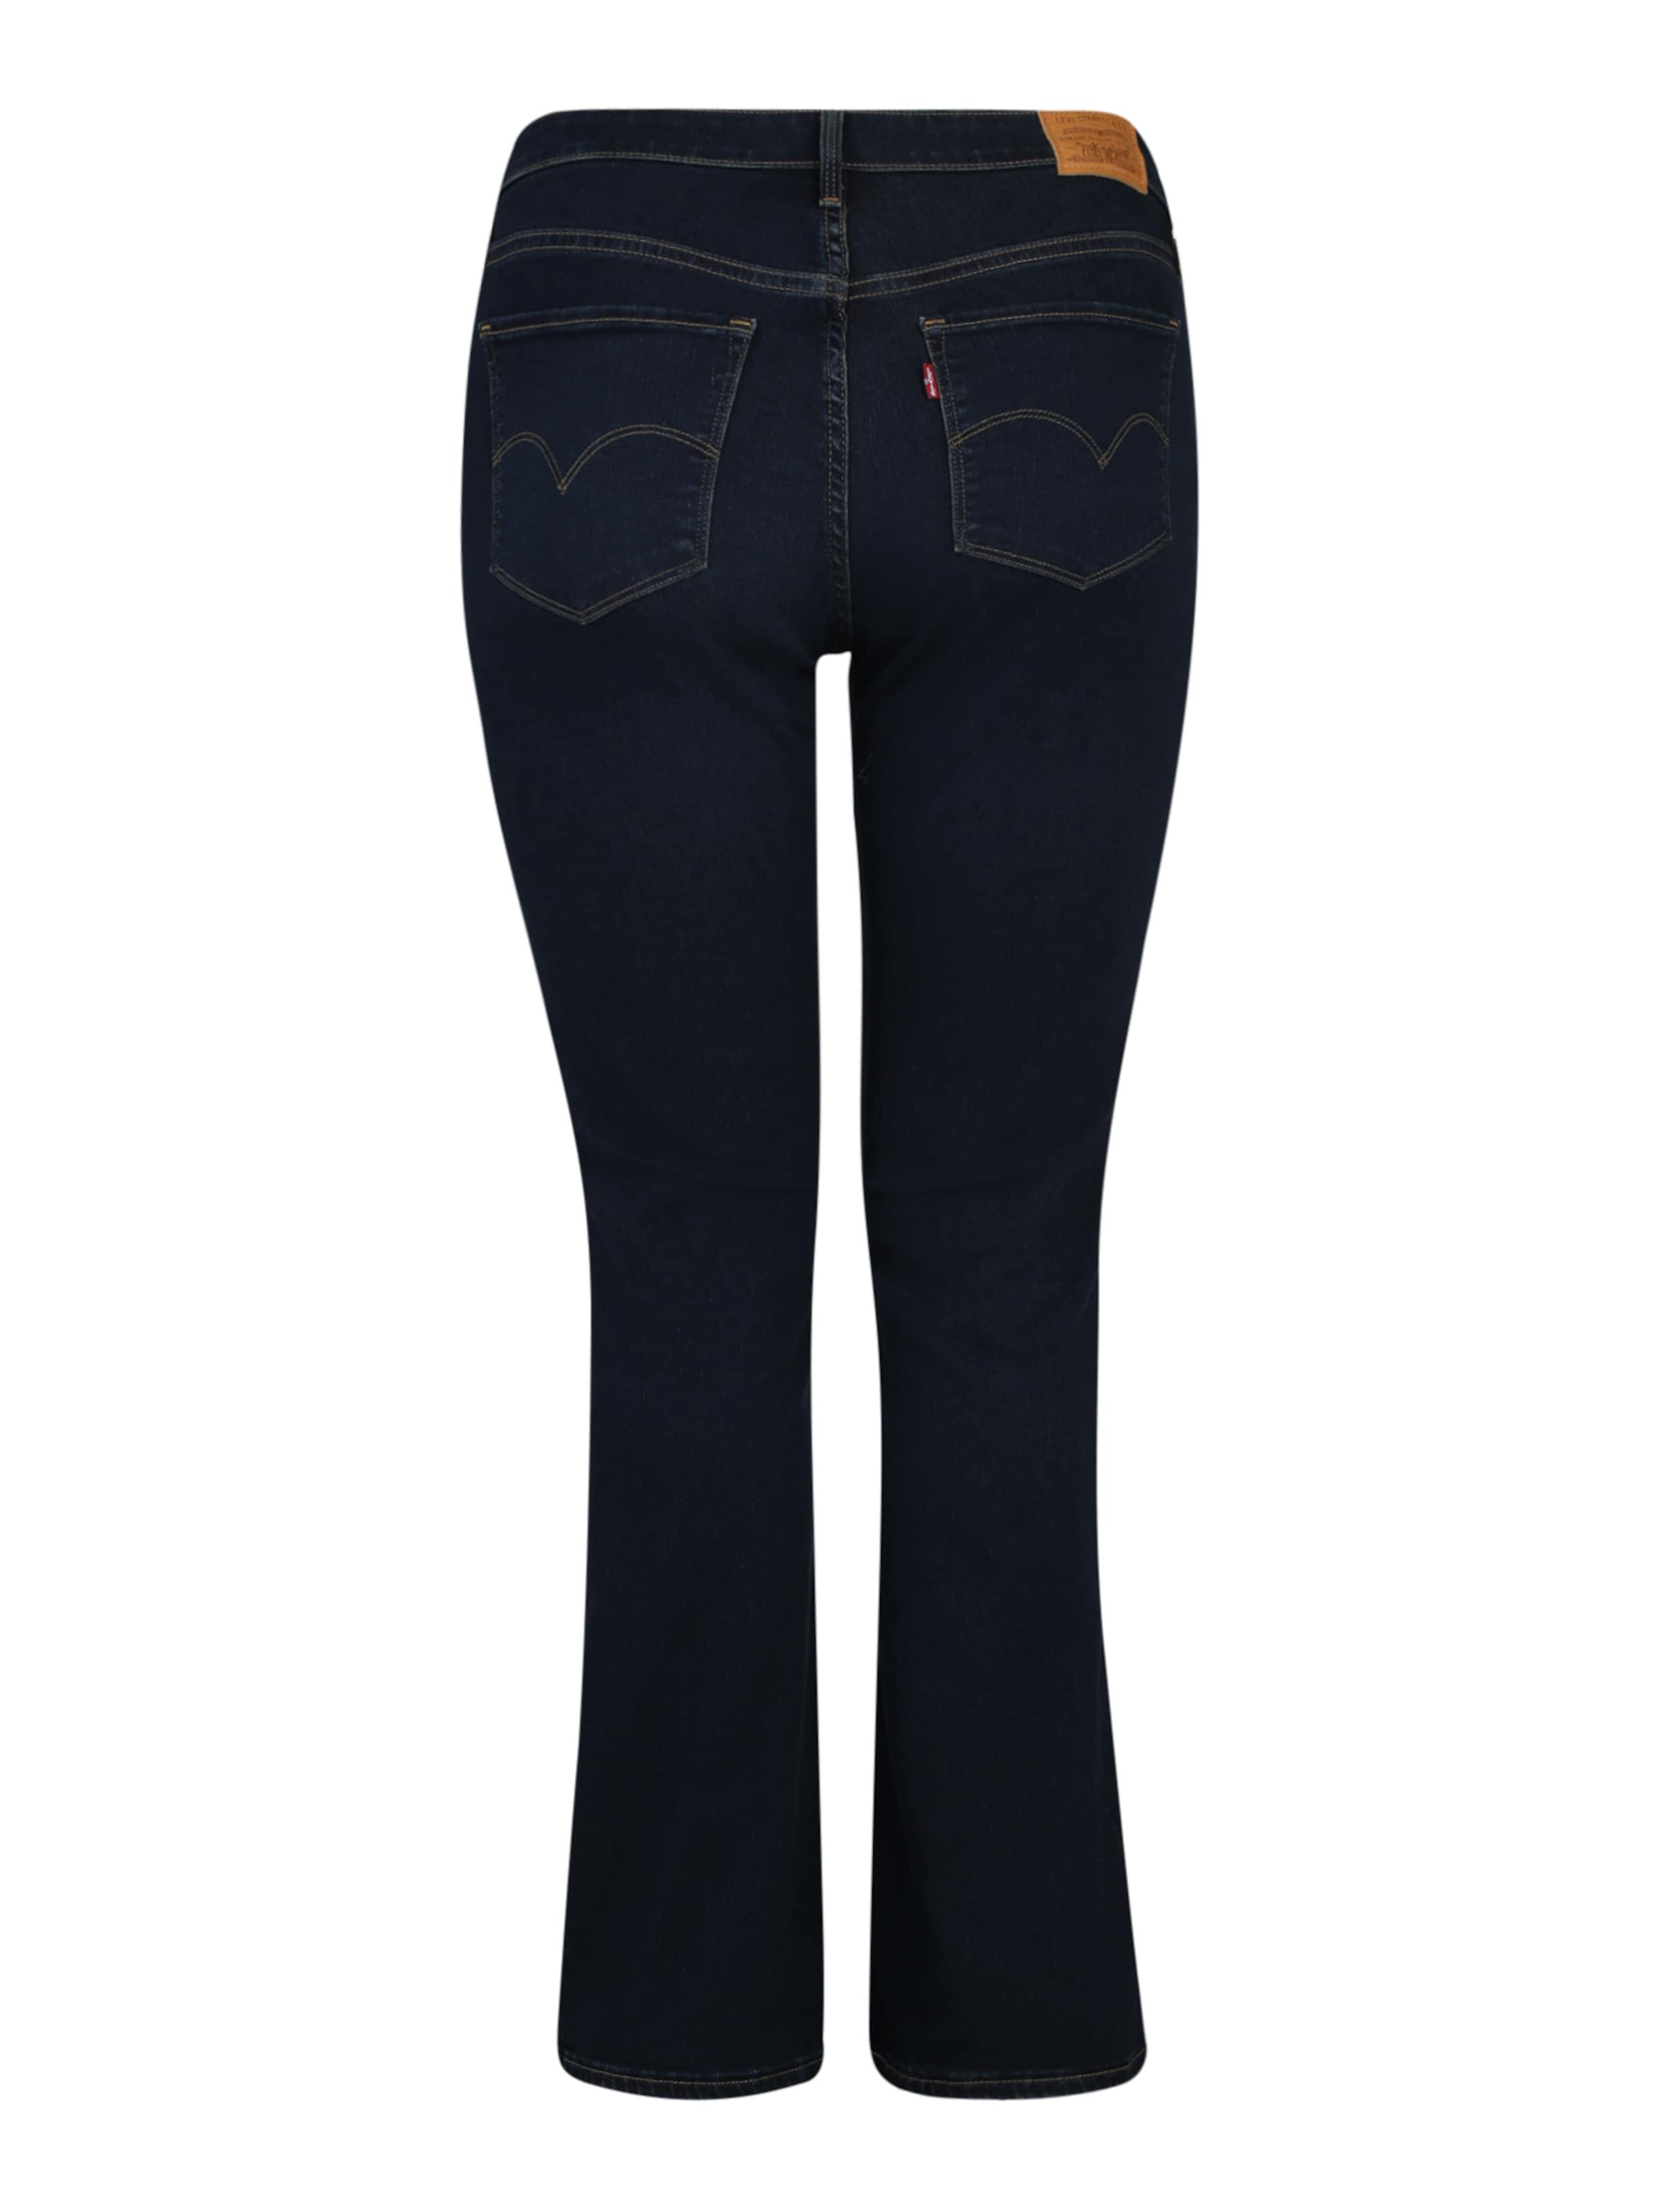 Denim Jeans Blue Onnightsplus' '315 Plus In Levi's® Plshapingbootlond 7yIYbgvf6m